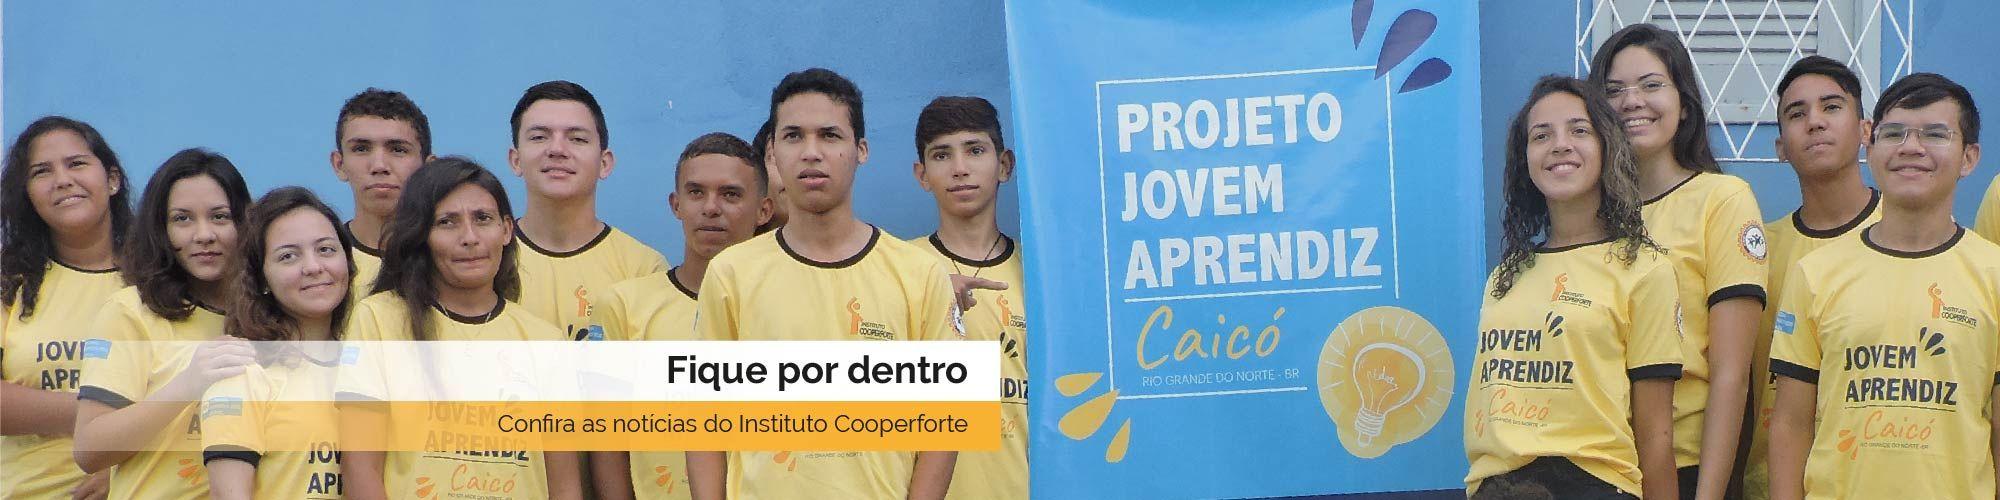 Instituto-Cooperforte---banner-02_2